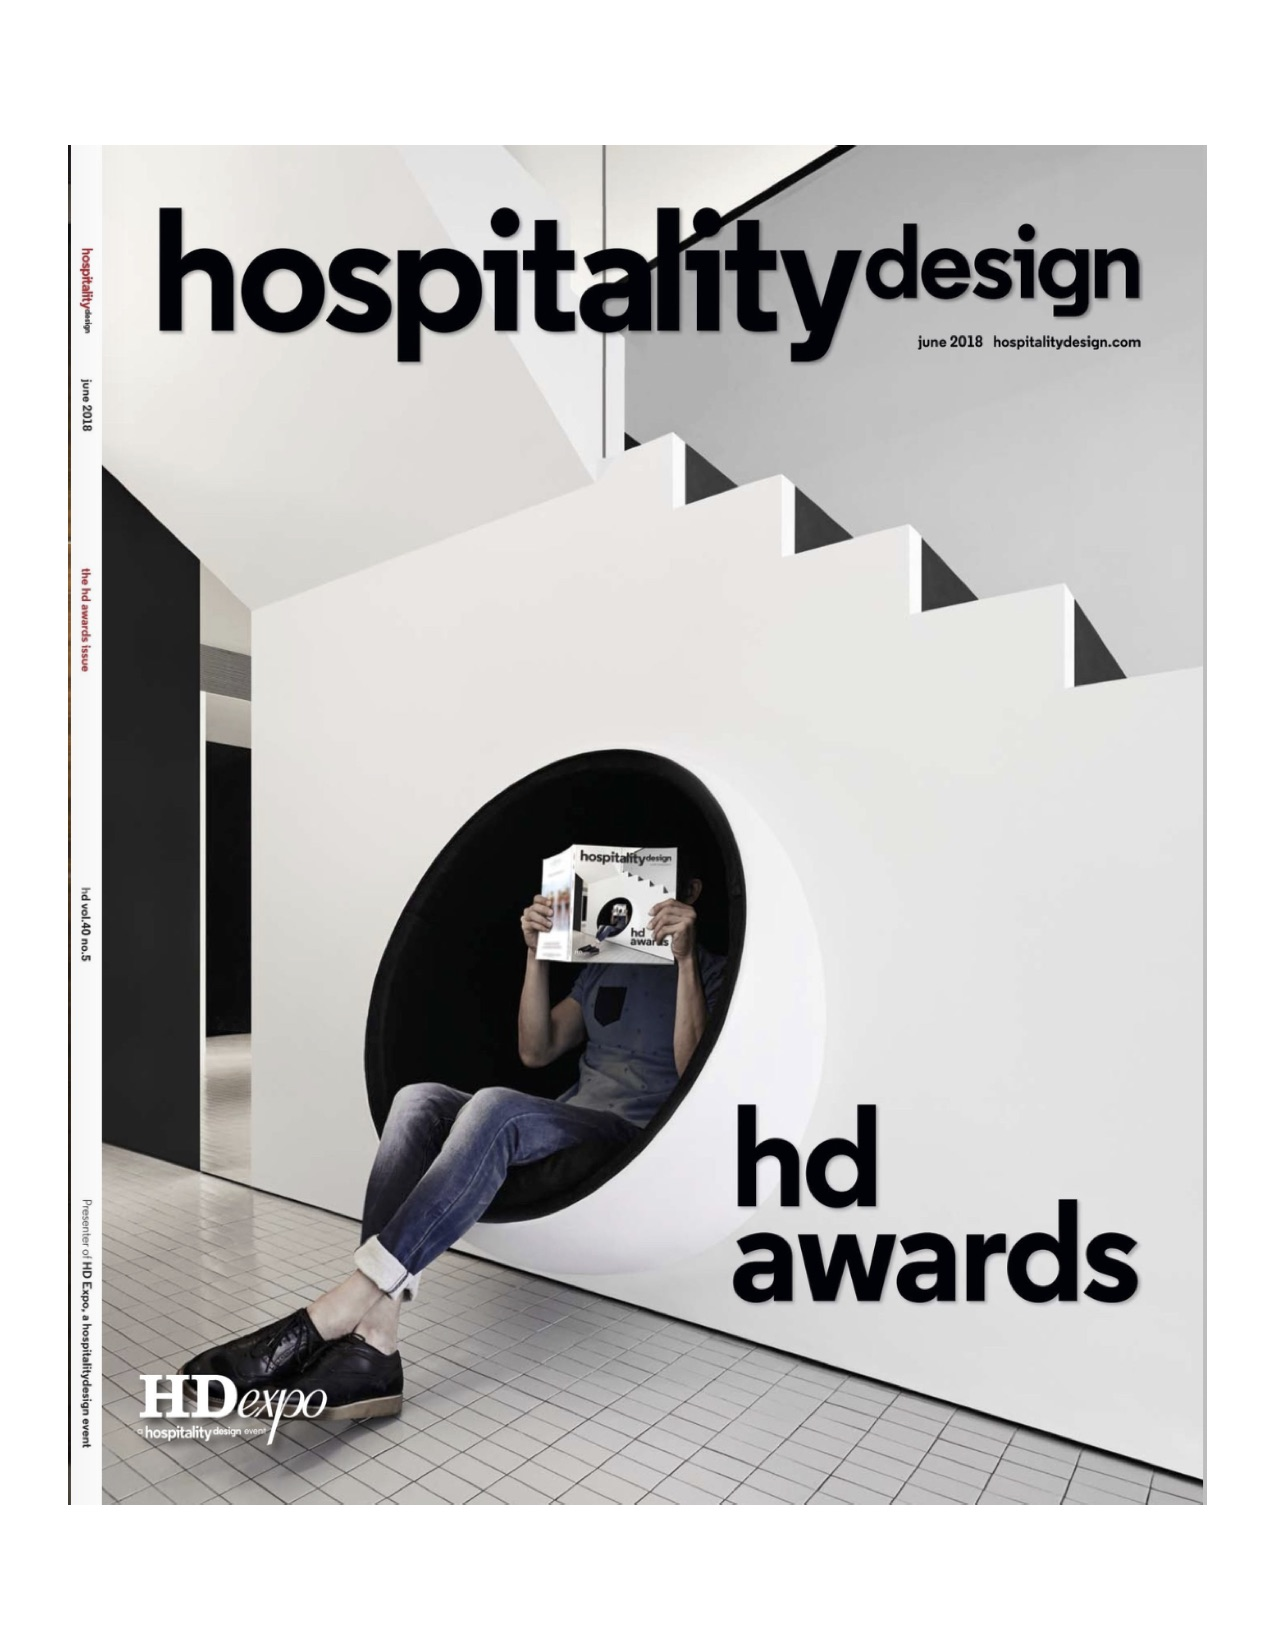 Born & Raised, Hospitality Design, HD 2018 Award Winner